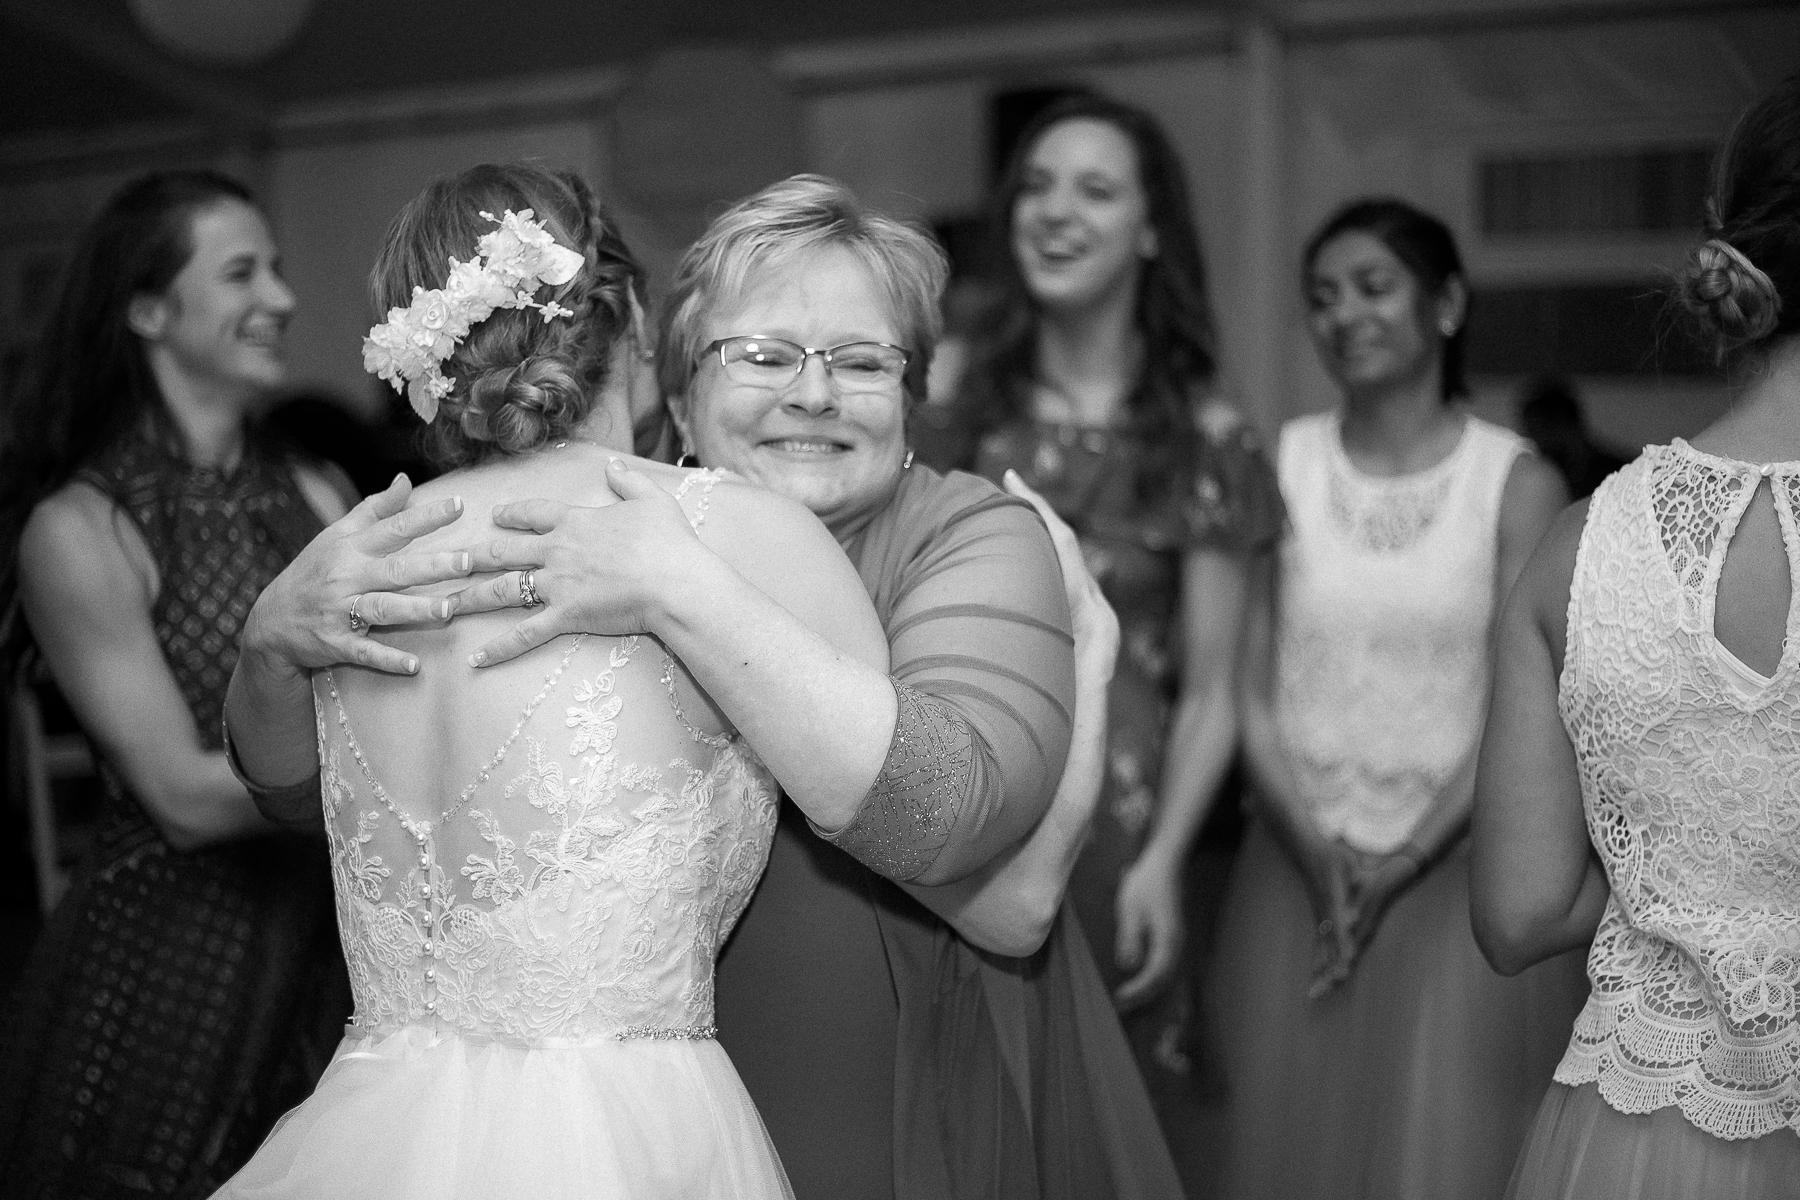 Elkridge-Furnace-Inn-Wedding-Reception-Bride-Groom-50